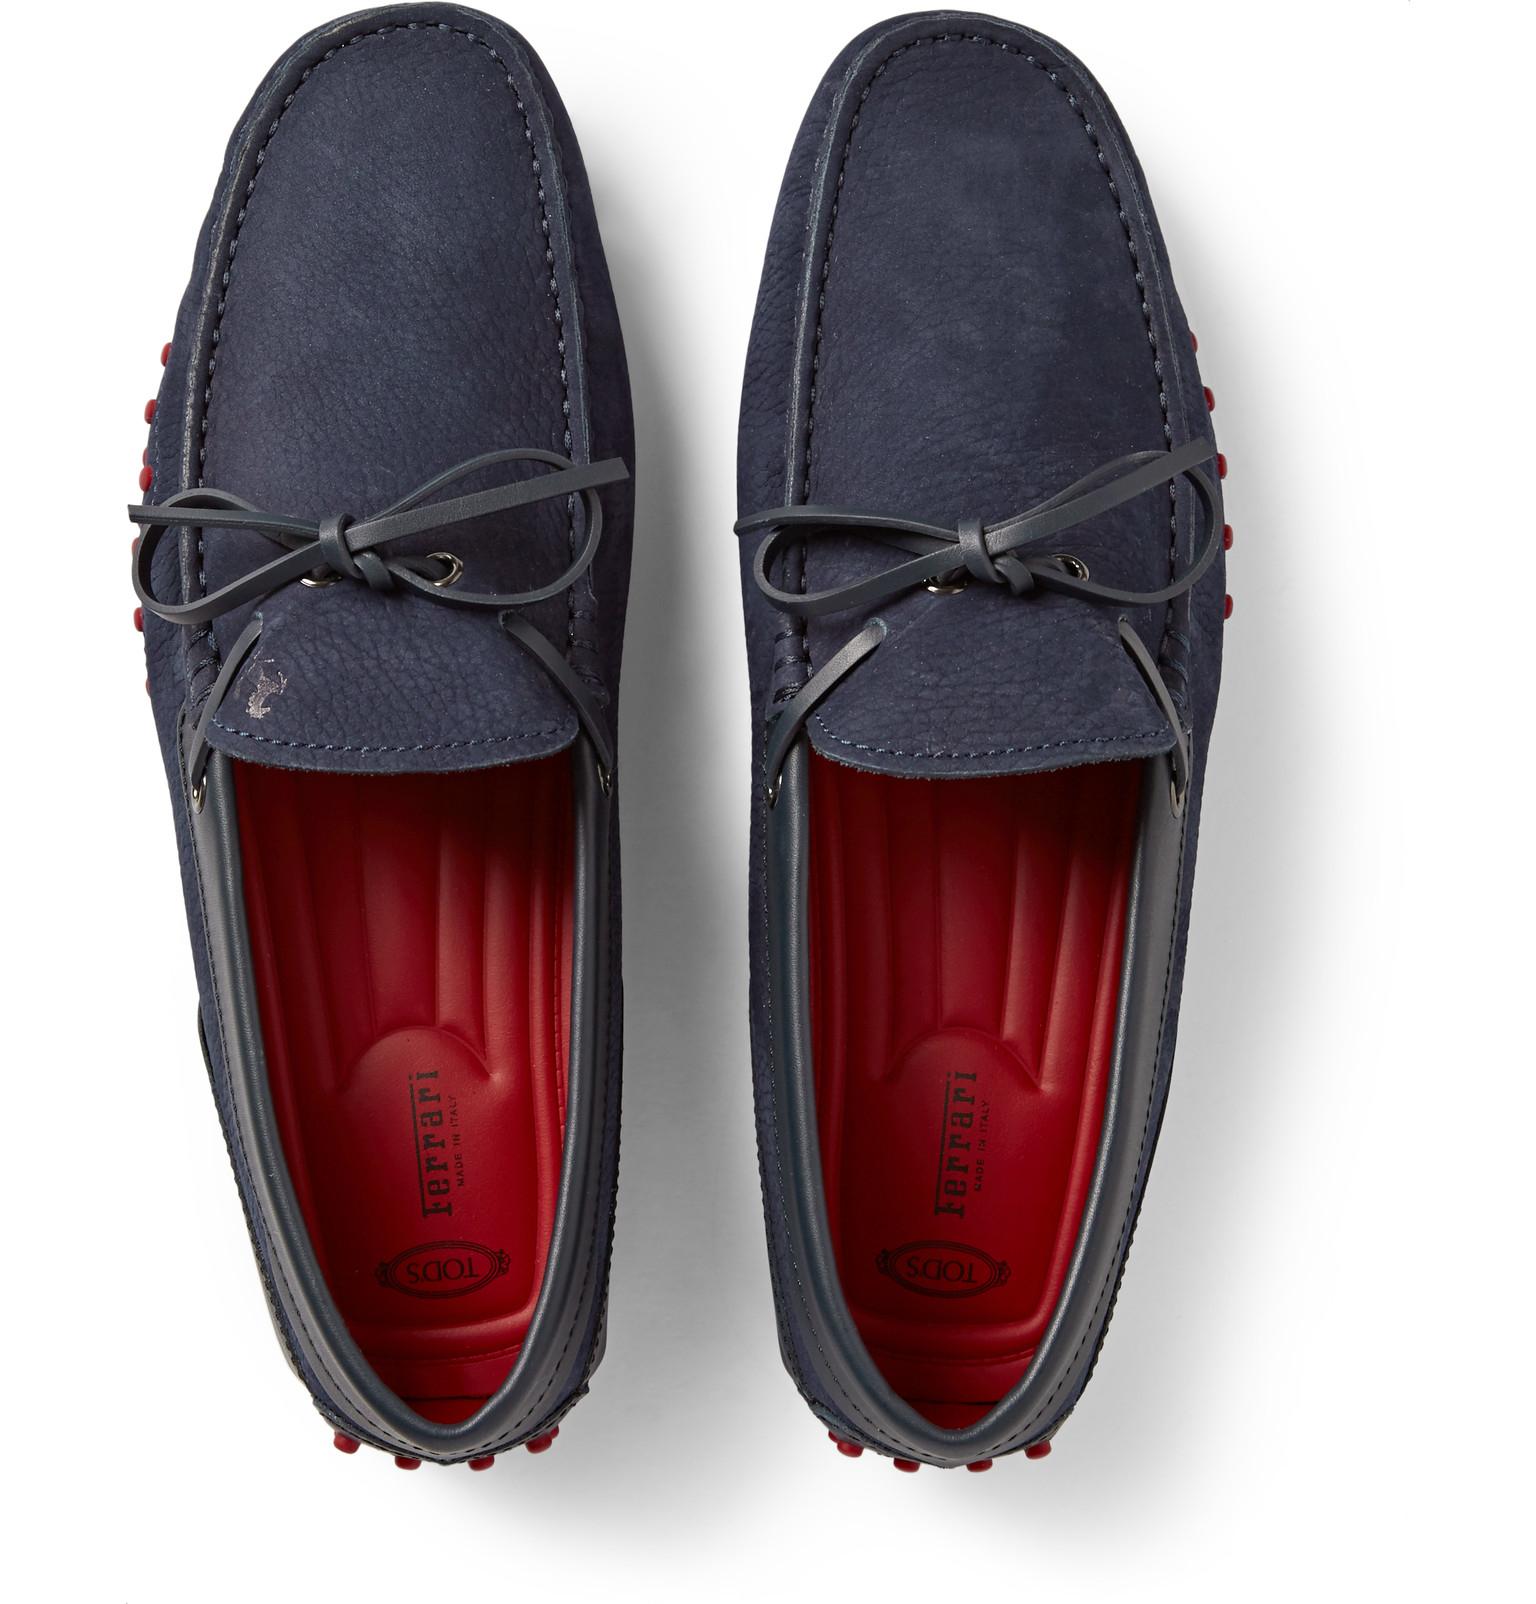 loafers footweartods store footwear celebrities loafertods tods men p green accessories tod ferrari loafer driving blue shoes moccasins handbags online s dark salestylish